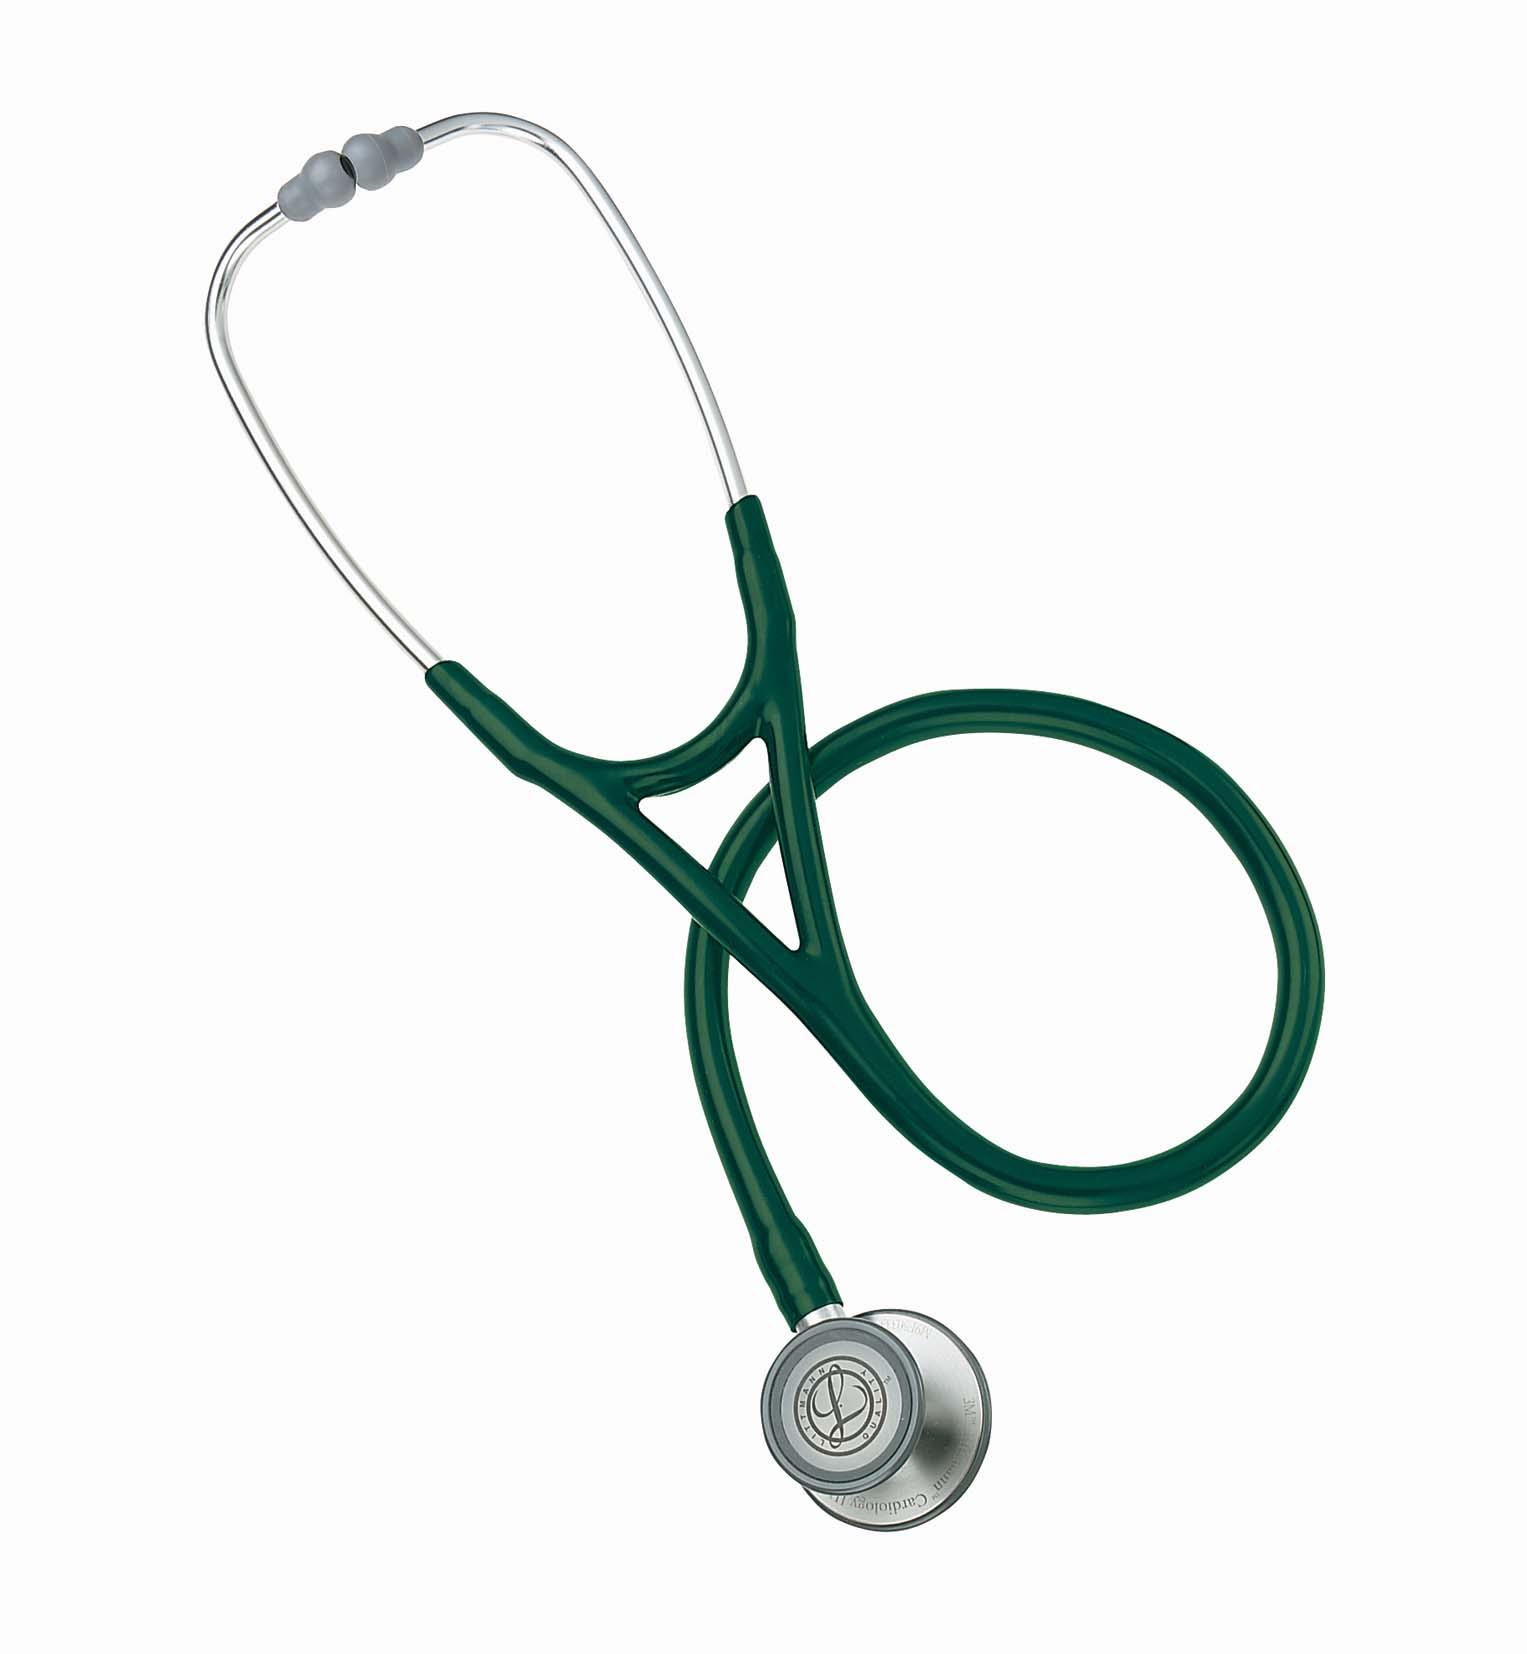 littmann-cardiology-iii-stethoscope-adult-black-3128-12-312-020-lr.jpg